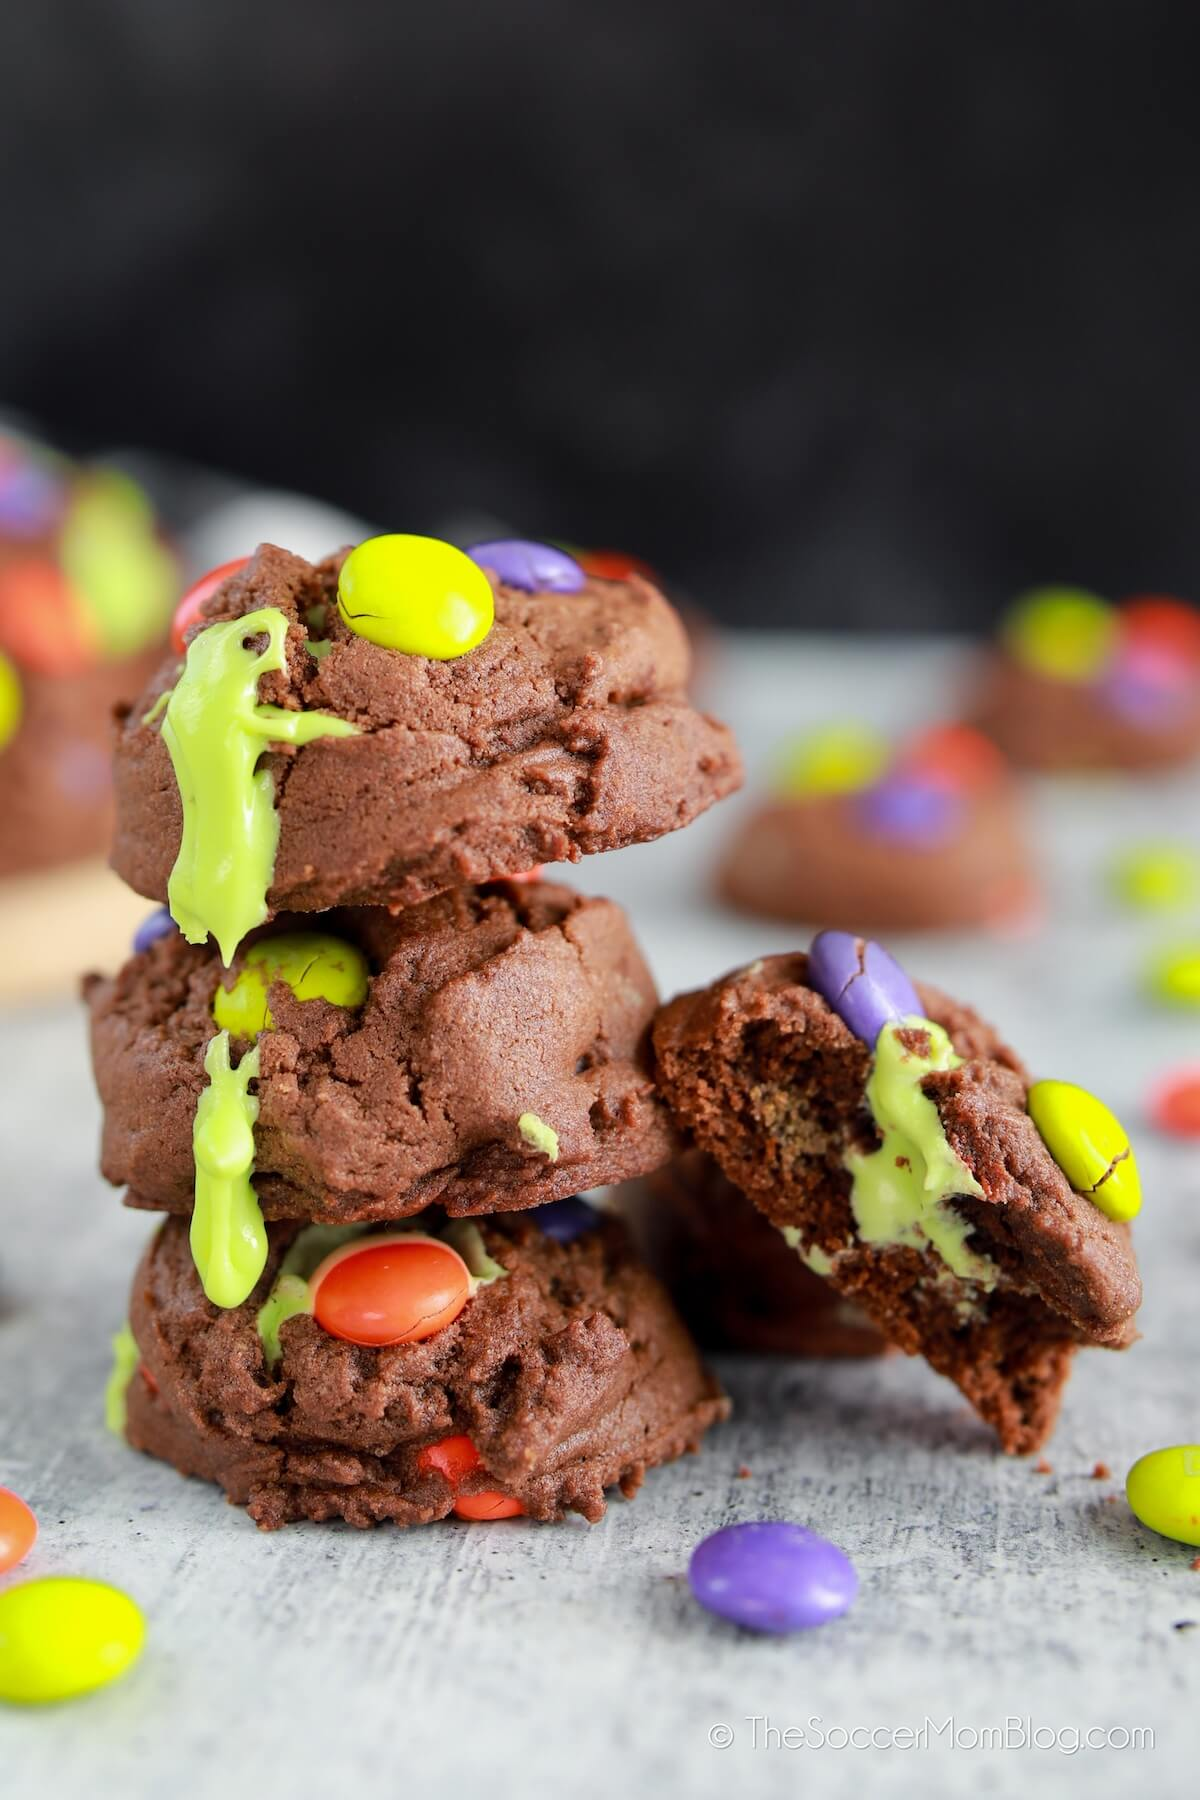 Pila de galletas de Halloween con glaseado verde rezumante